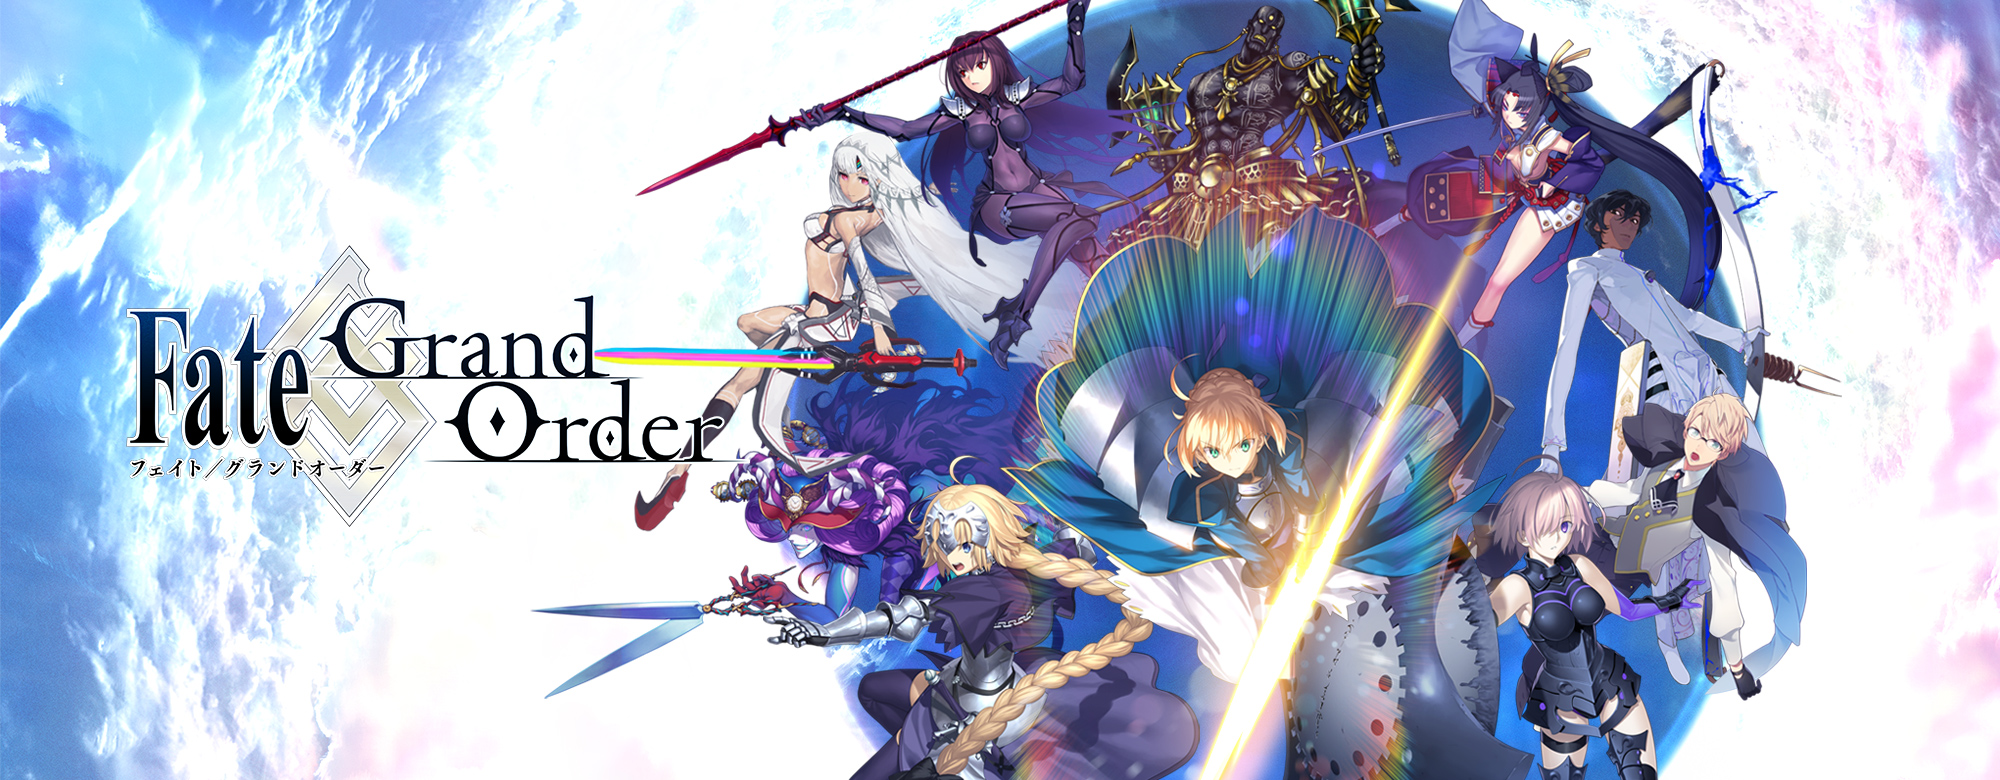 Fate Grand Orderの世界 Fate Grand Order 公式サイト